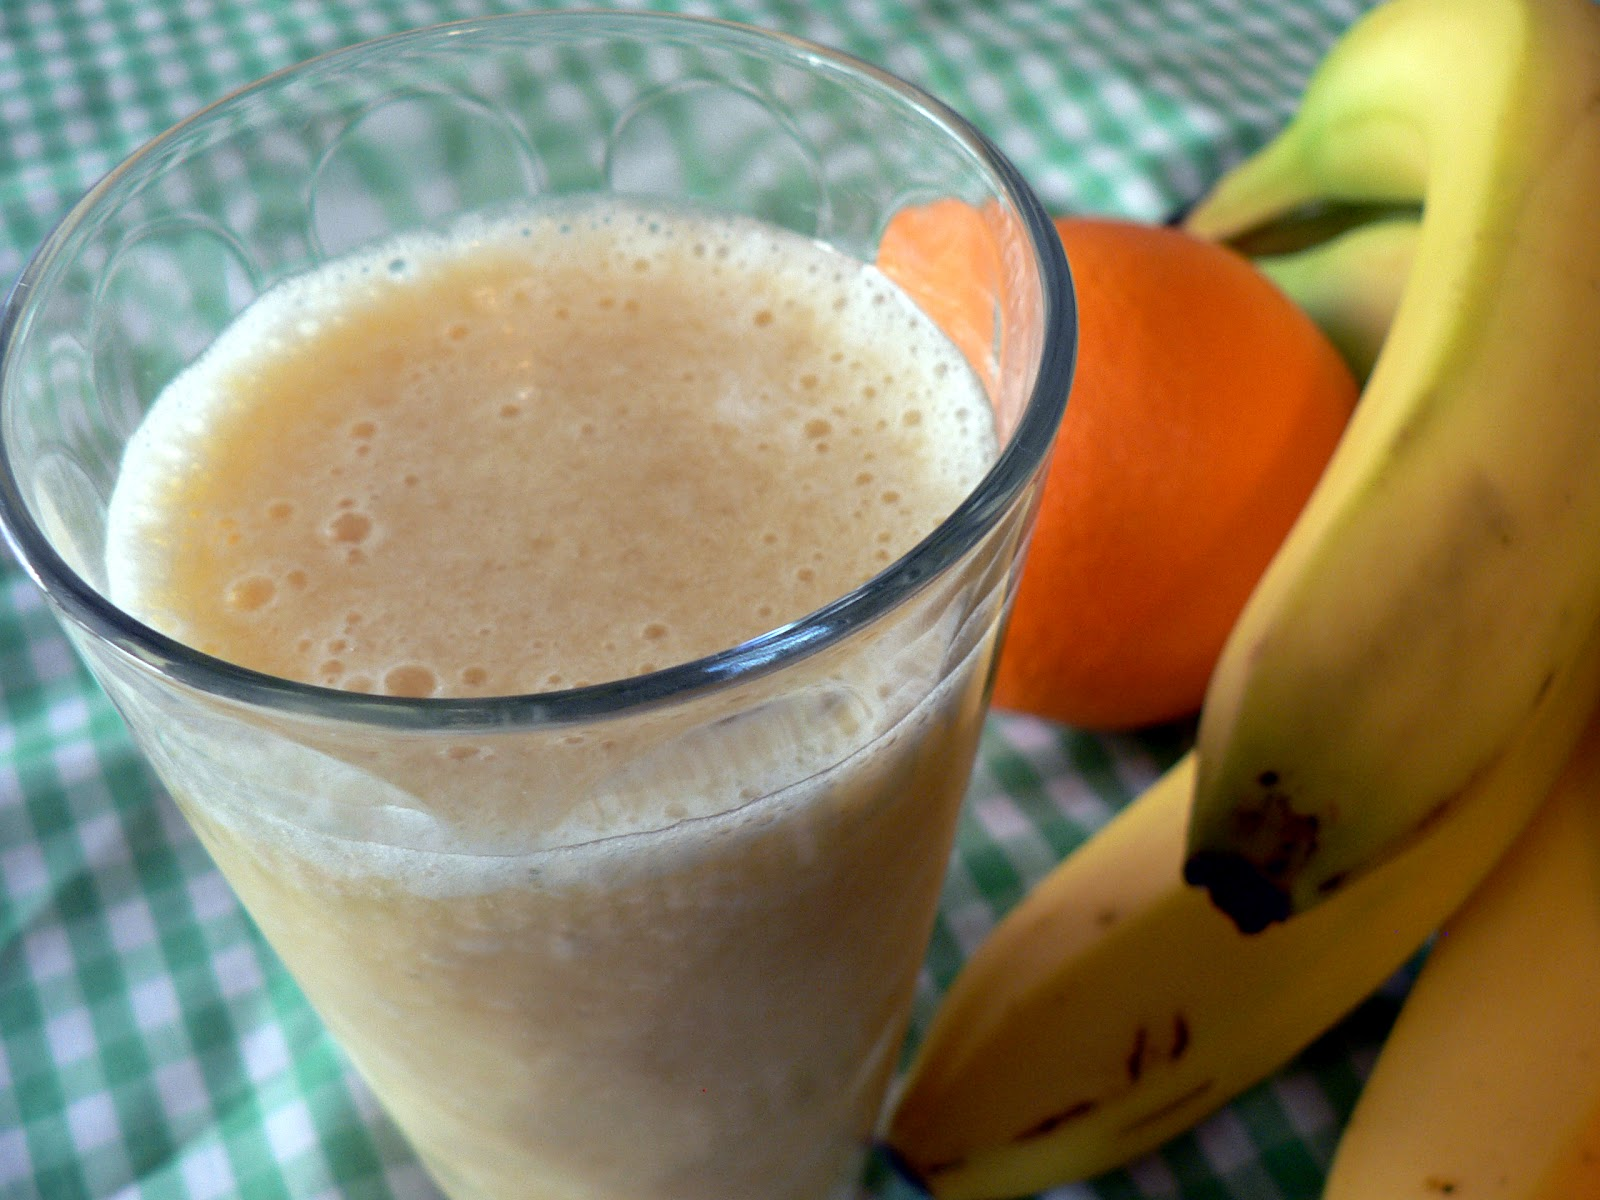 Orange Pineapple Banana Smoothie - Bless This Mess